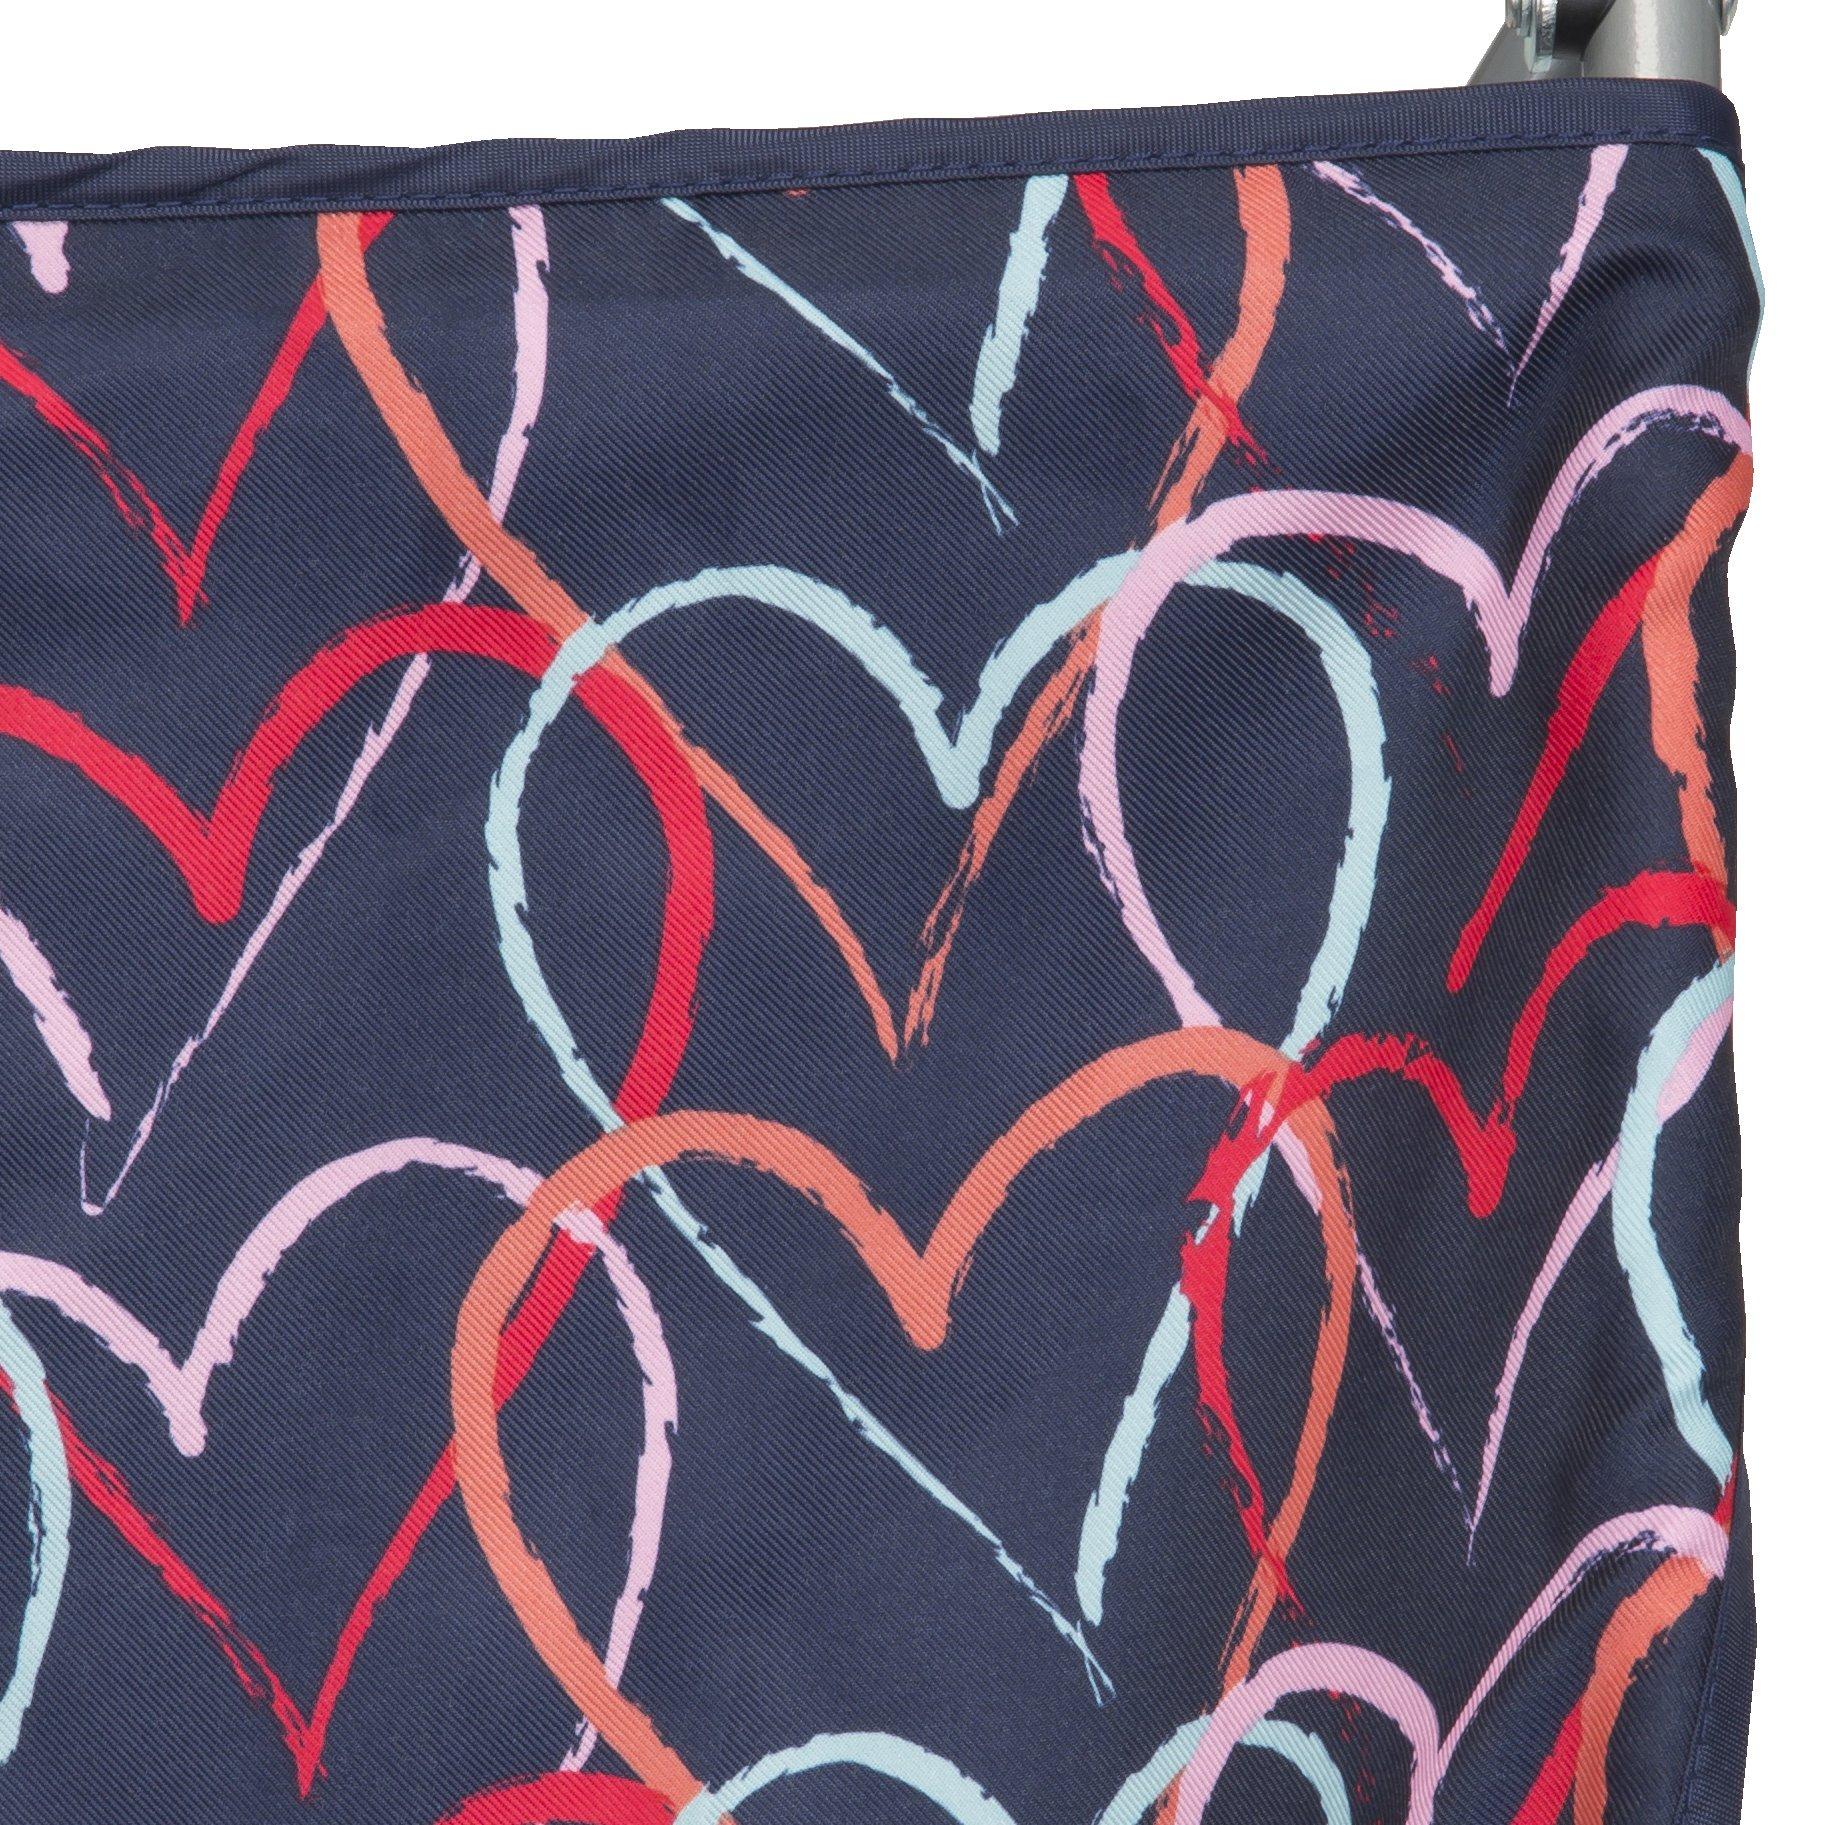 Cosco Umbrella Stroller, Chalk Hearts by Cosco (Image #2)